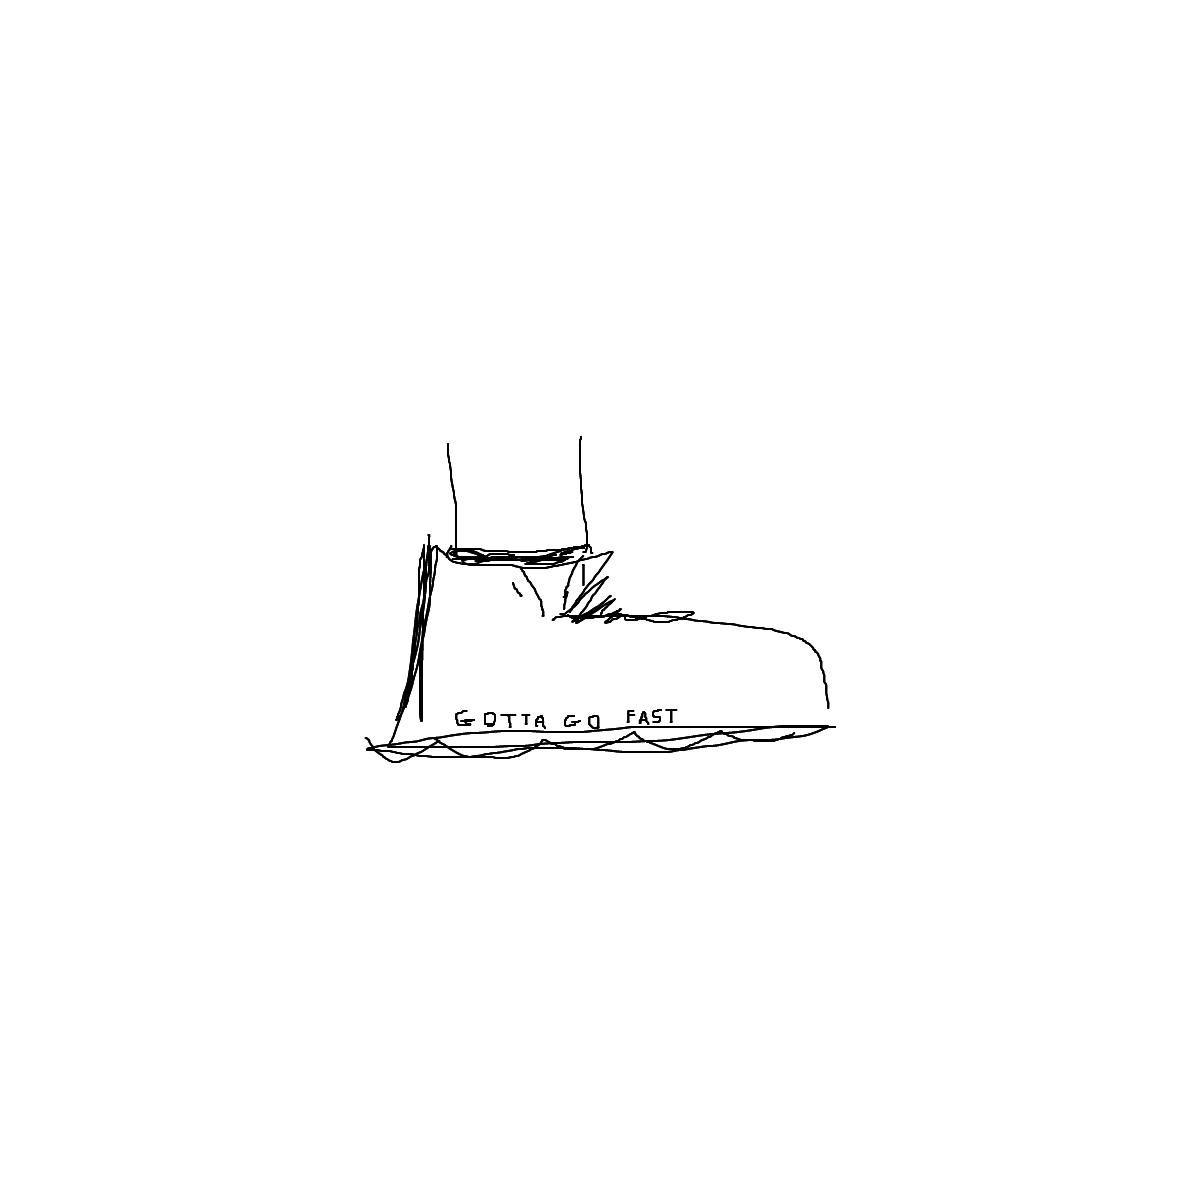 BAAAM drawing#13843 lat:36.8898849487304700lng: -75.9921875000000000